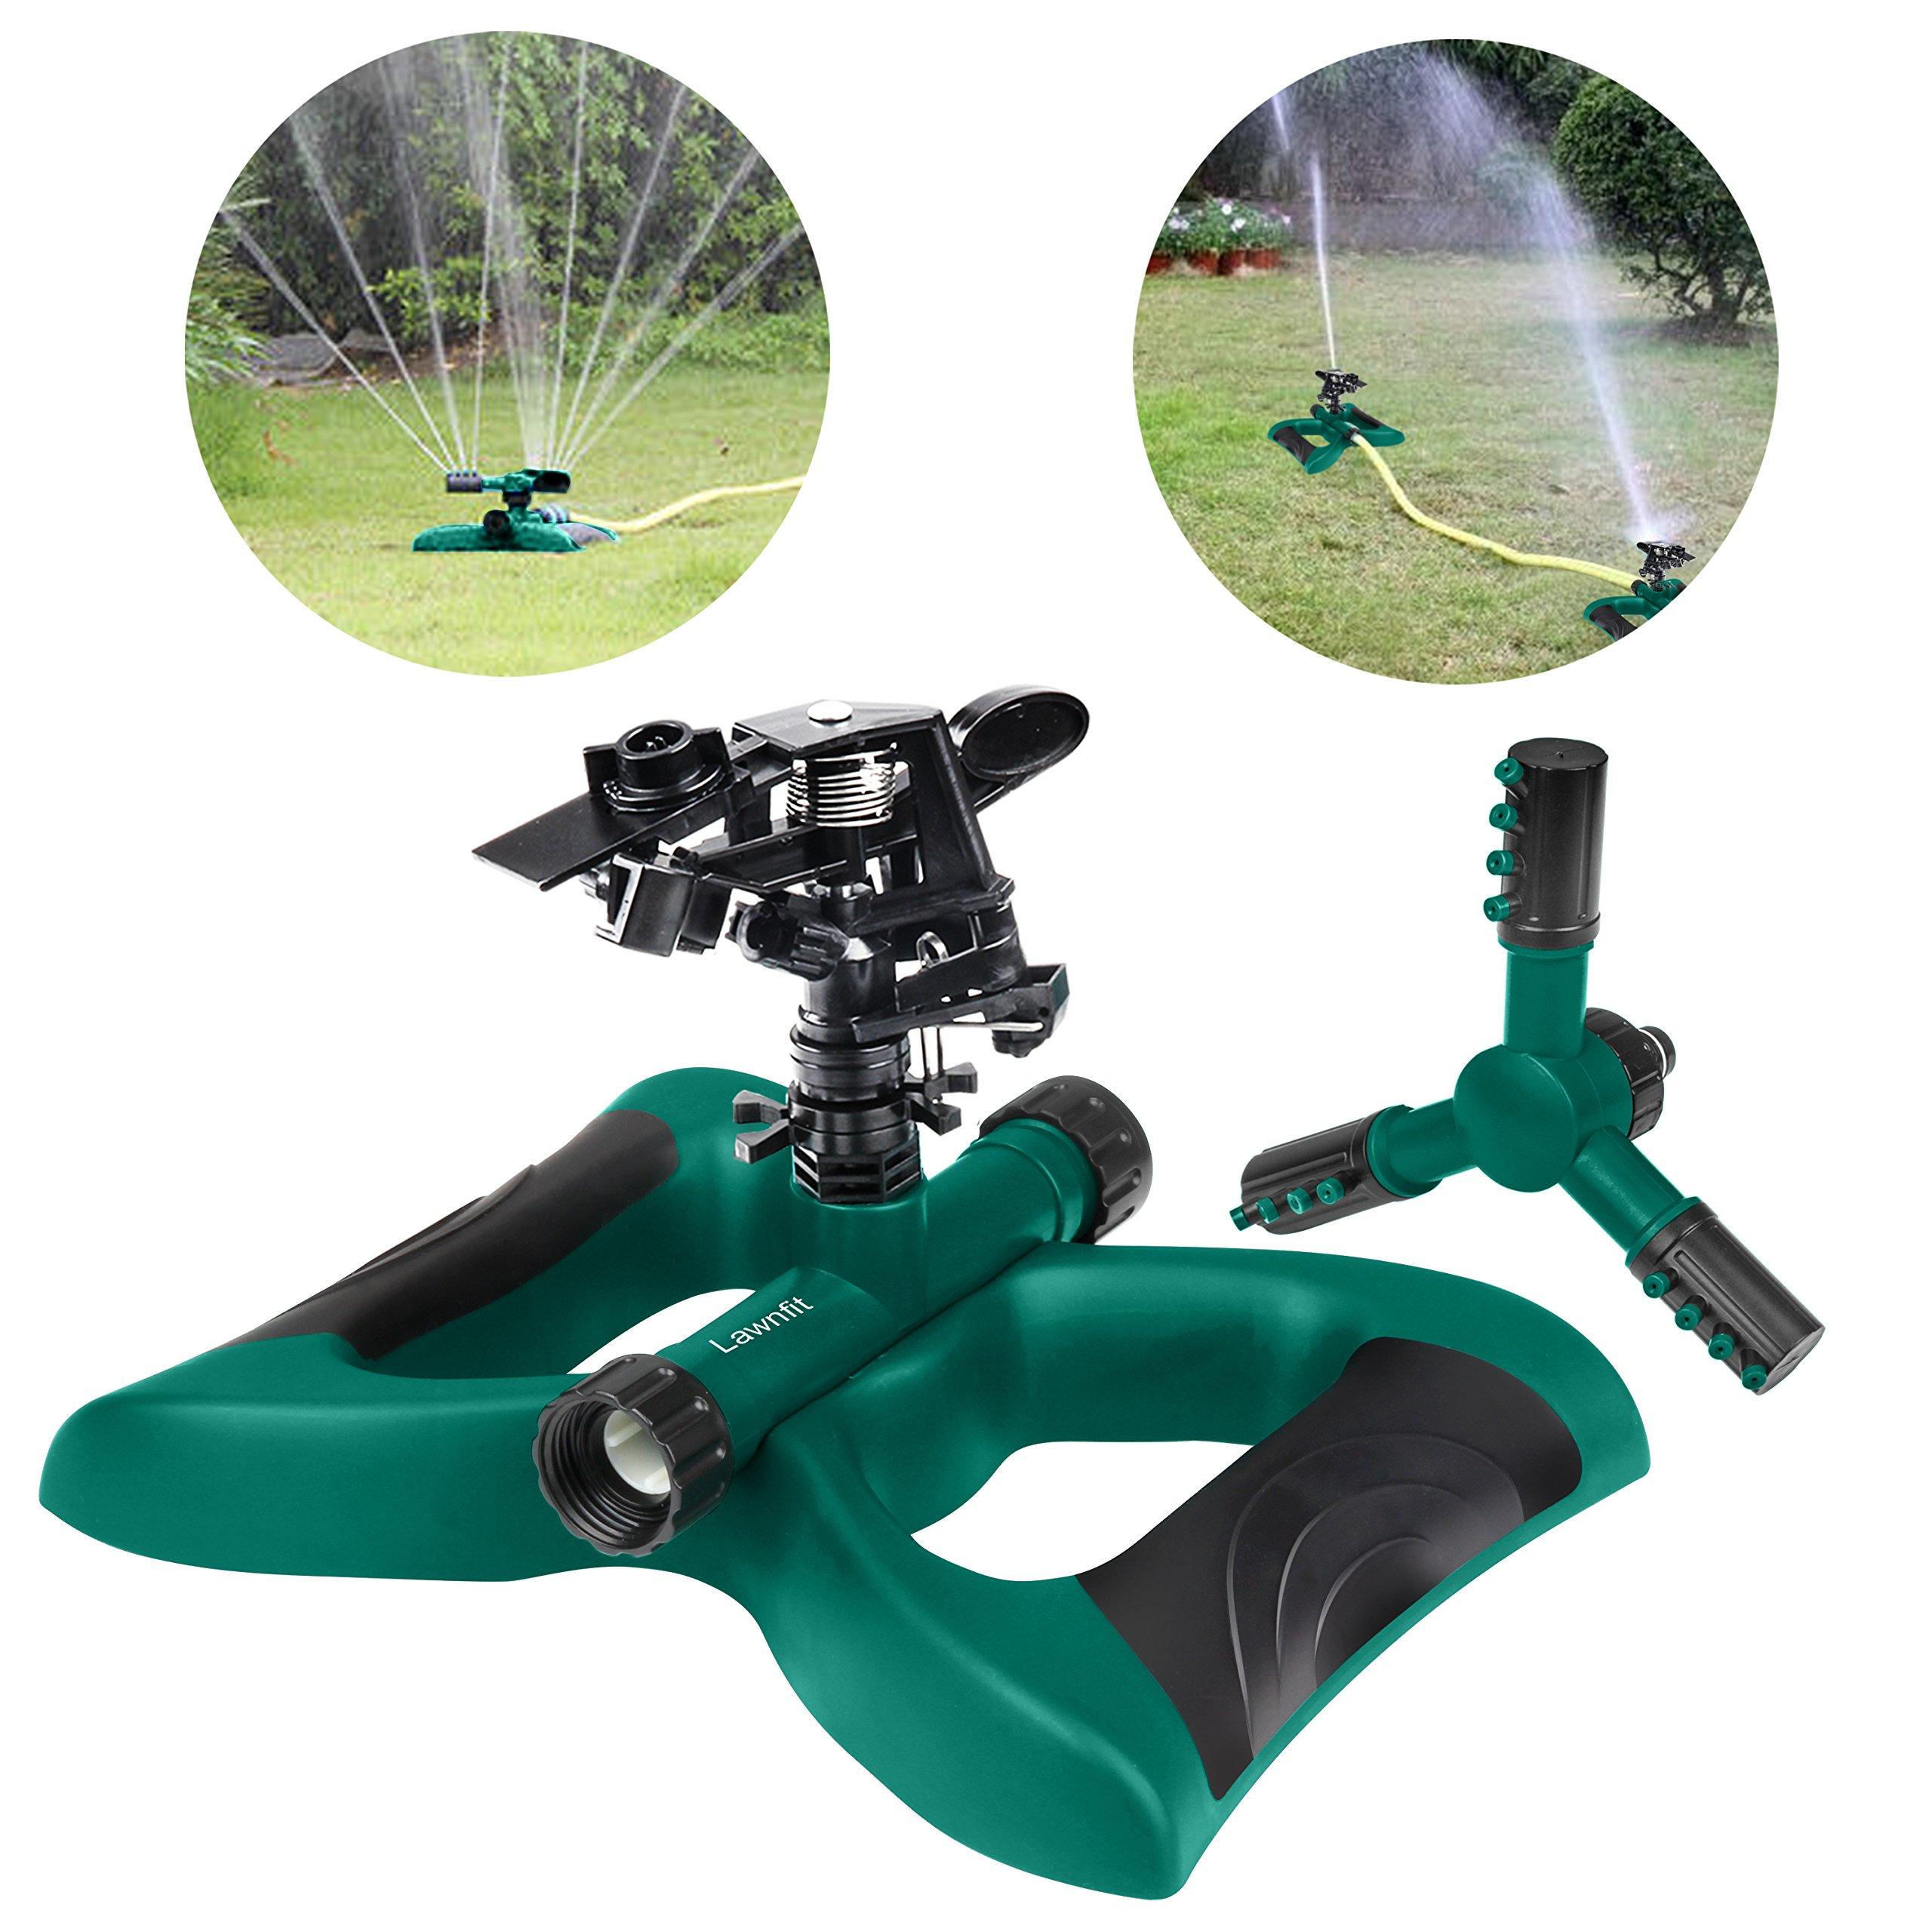 lawnsprinkler impactsprinkler 360degreerotatingsprinklerirrigationsystem Usedforgarden lawn outdoorautomaticsprinkler OscillatingRotaryHighImpactSprinklerSystem Twodifferentsprinkler